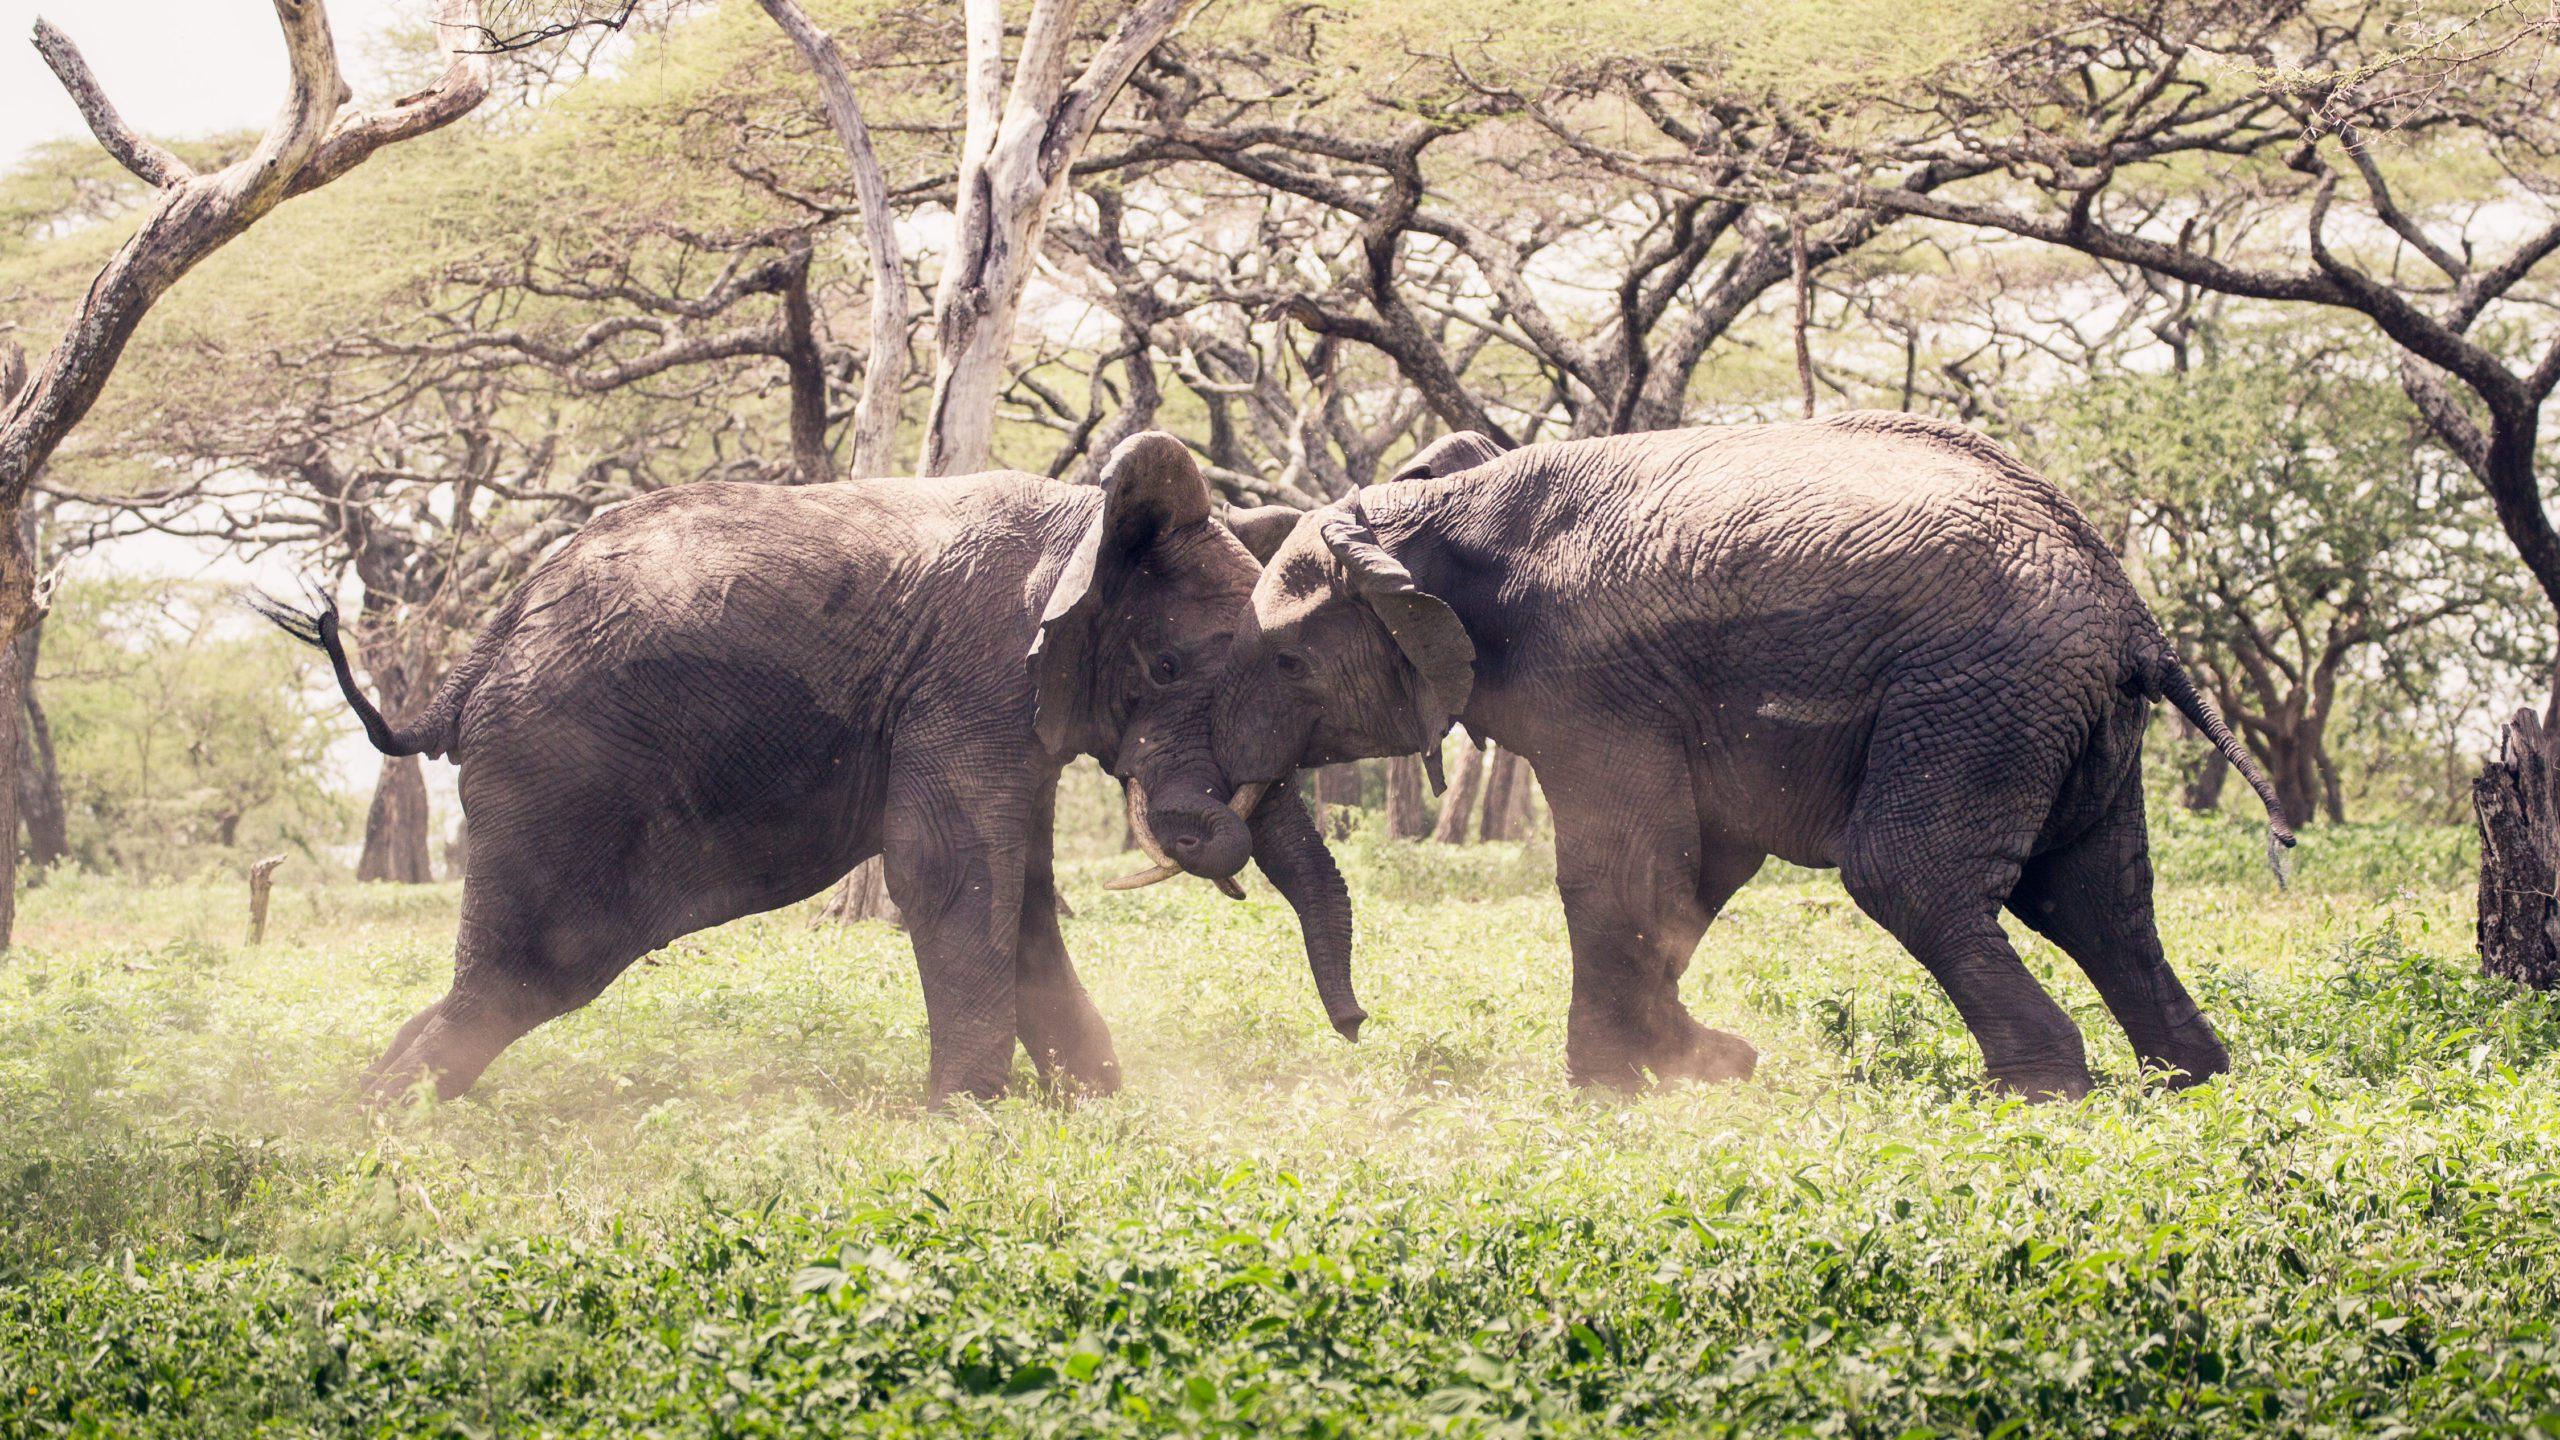 Elephants at Mwiba Lodge